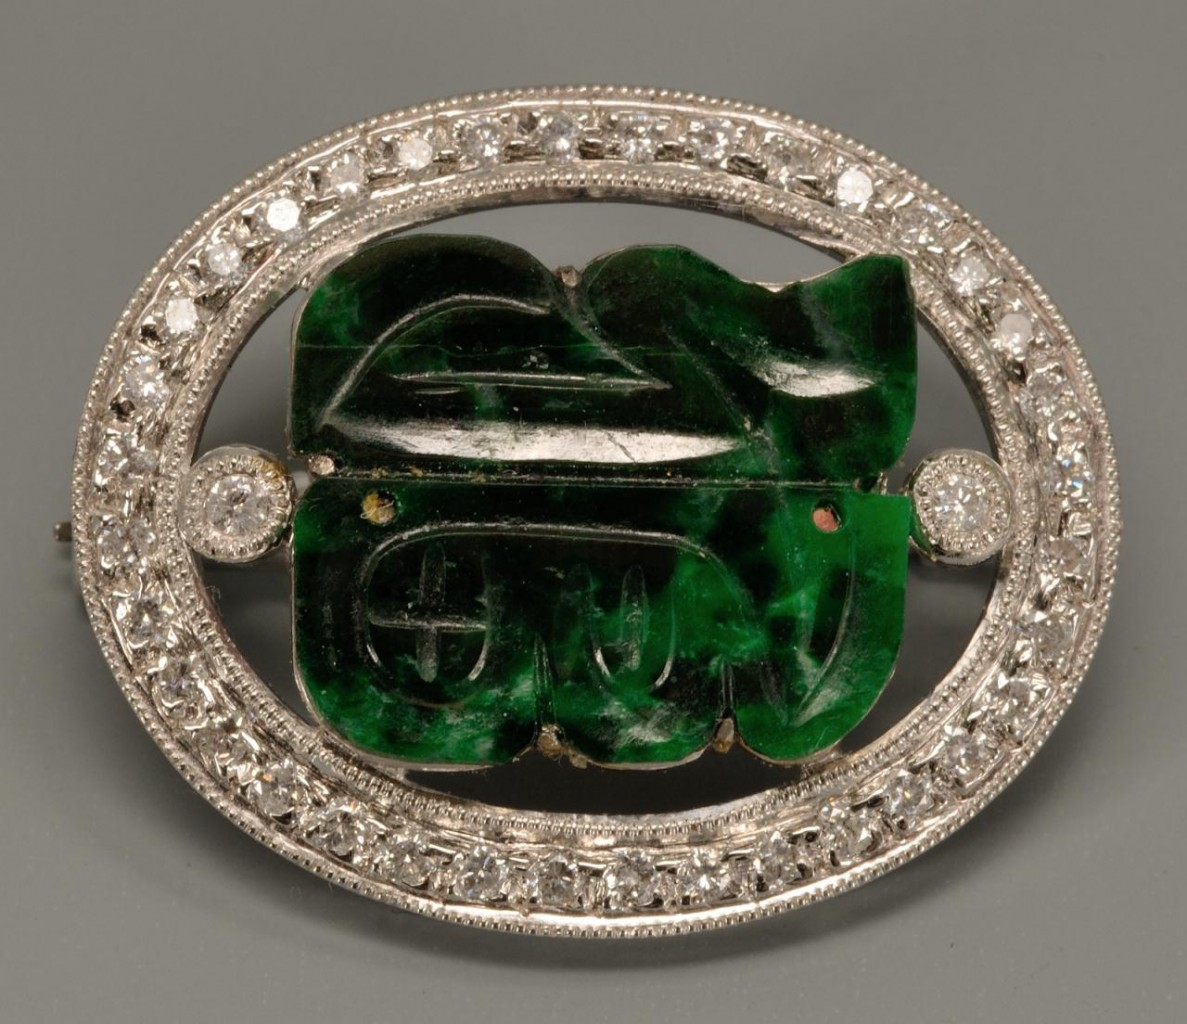 Lot 142: 18k white gold, jade and diamond brooch